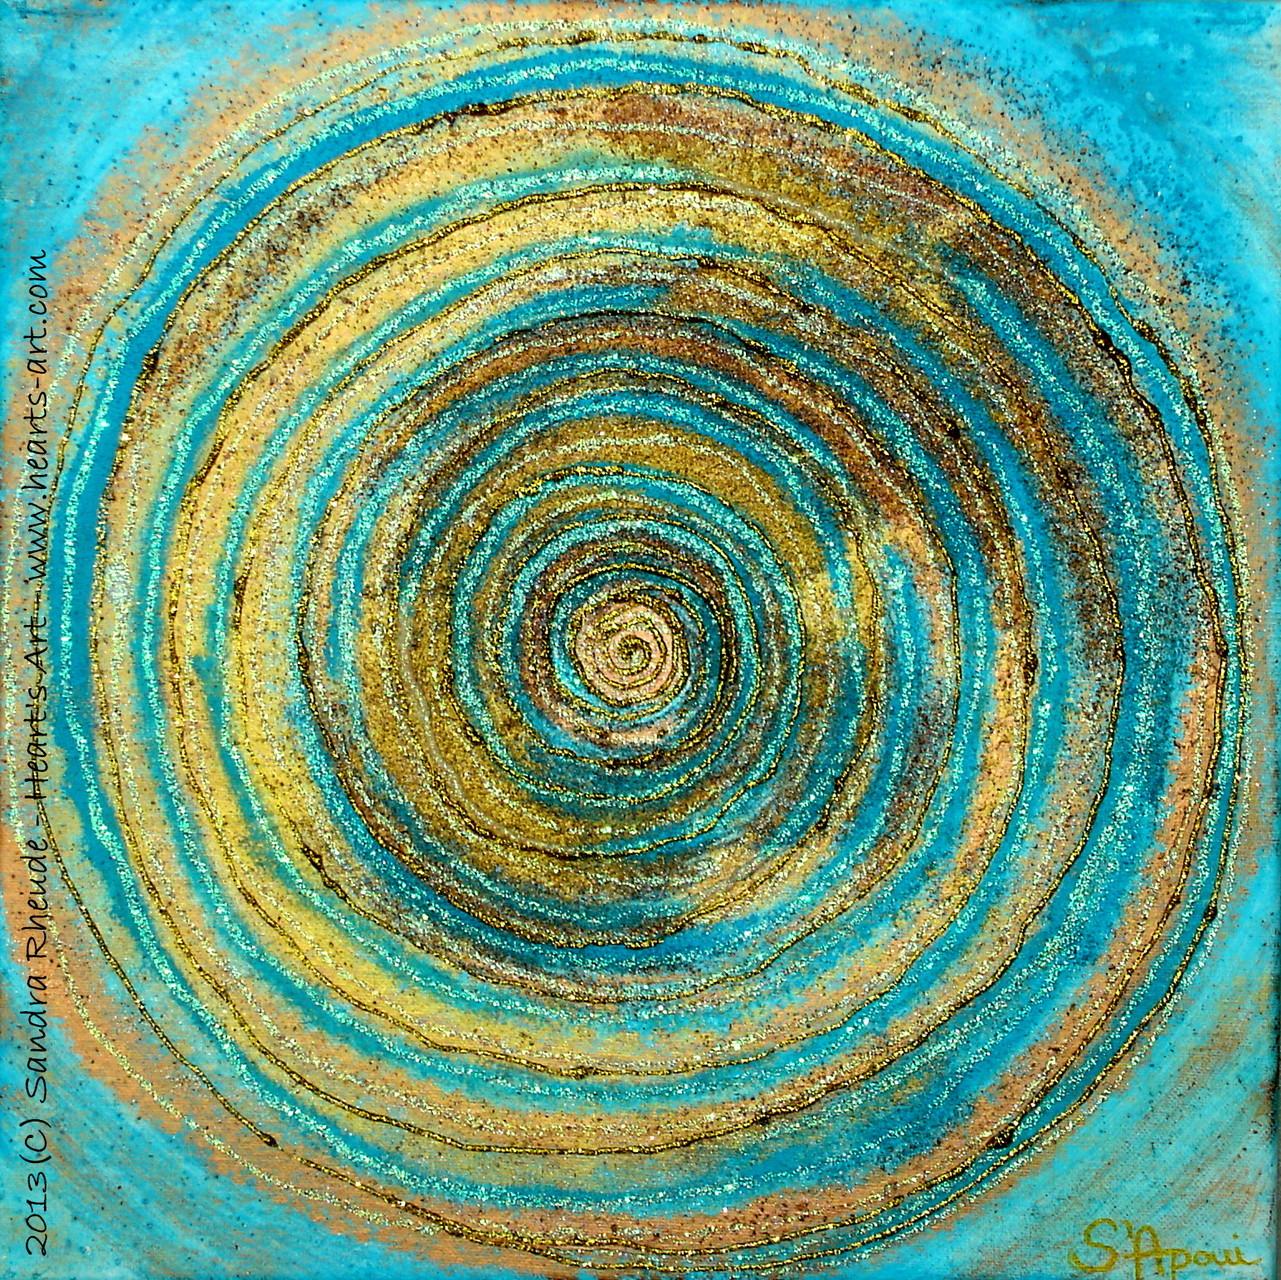 'Energiespirale' - 2013/61 - Acryl/MixedMedia auf Leinwand - 30 x 30 cm - € 110